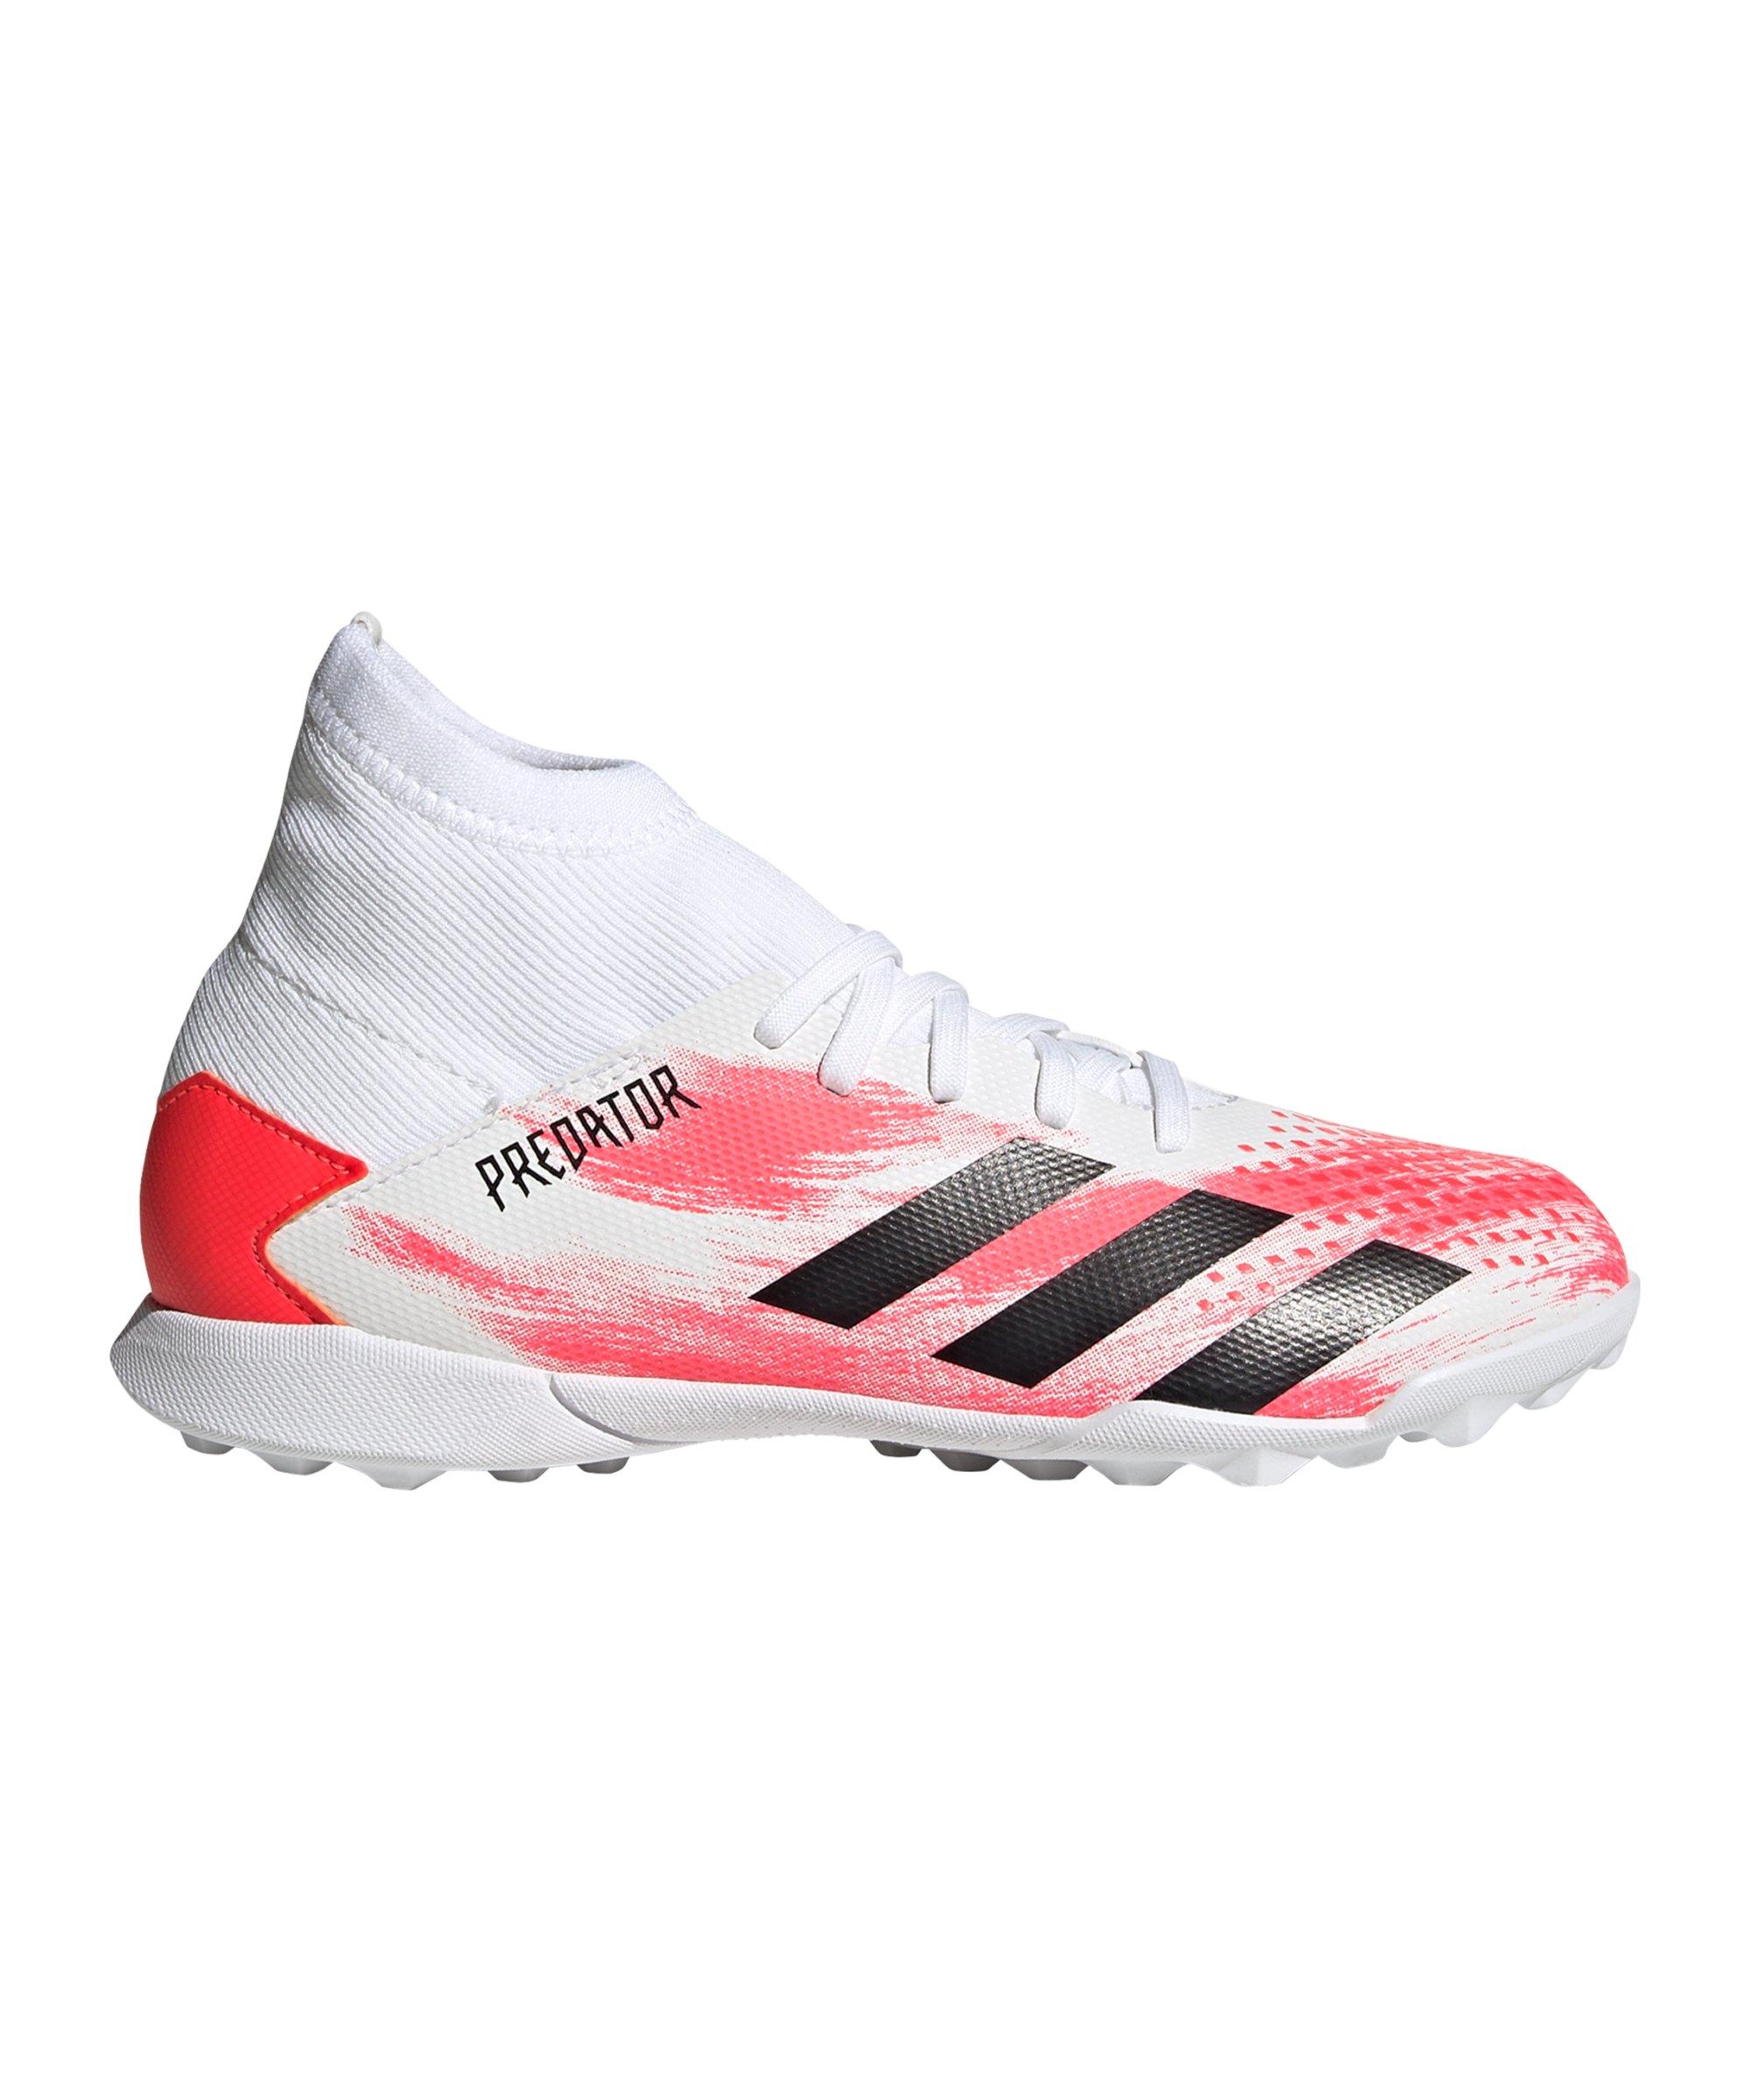 adidas Predator Uniforia 20.3 TF J Kids Weiss Rot - weiss